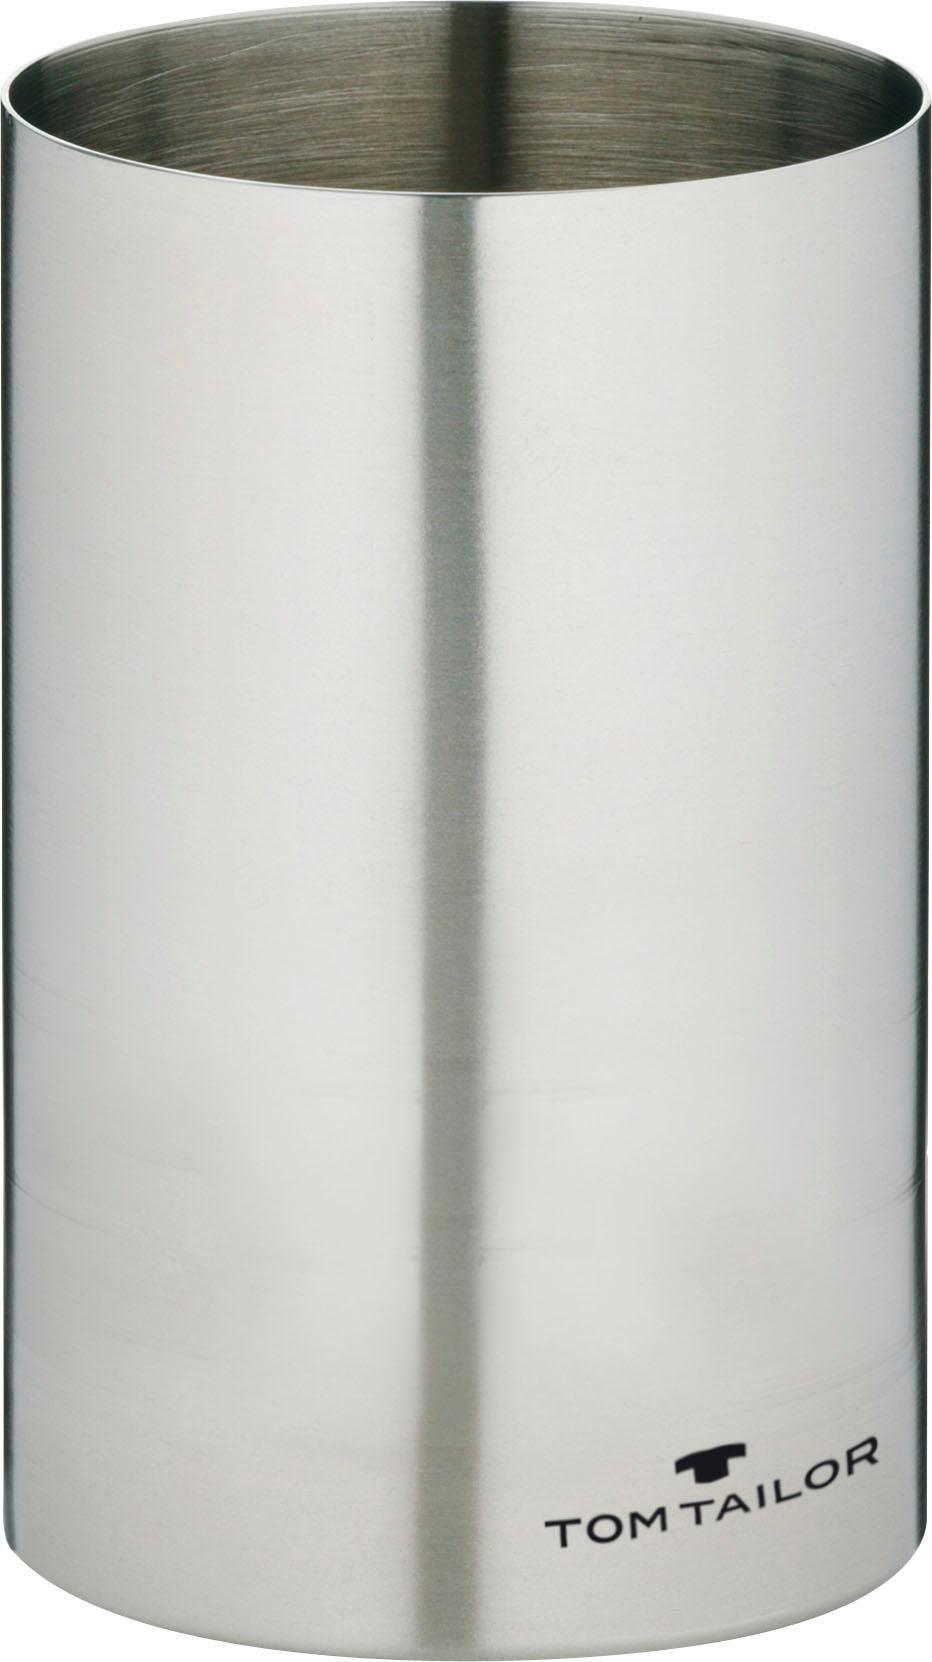 TOM TAILOR Zahnputzbecher »CLASSIC STEEL«